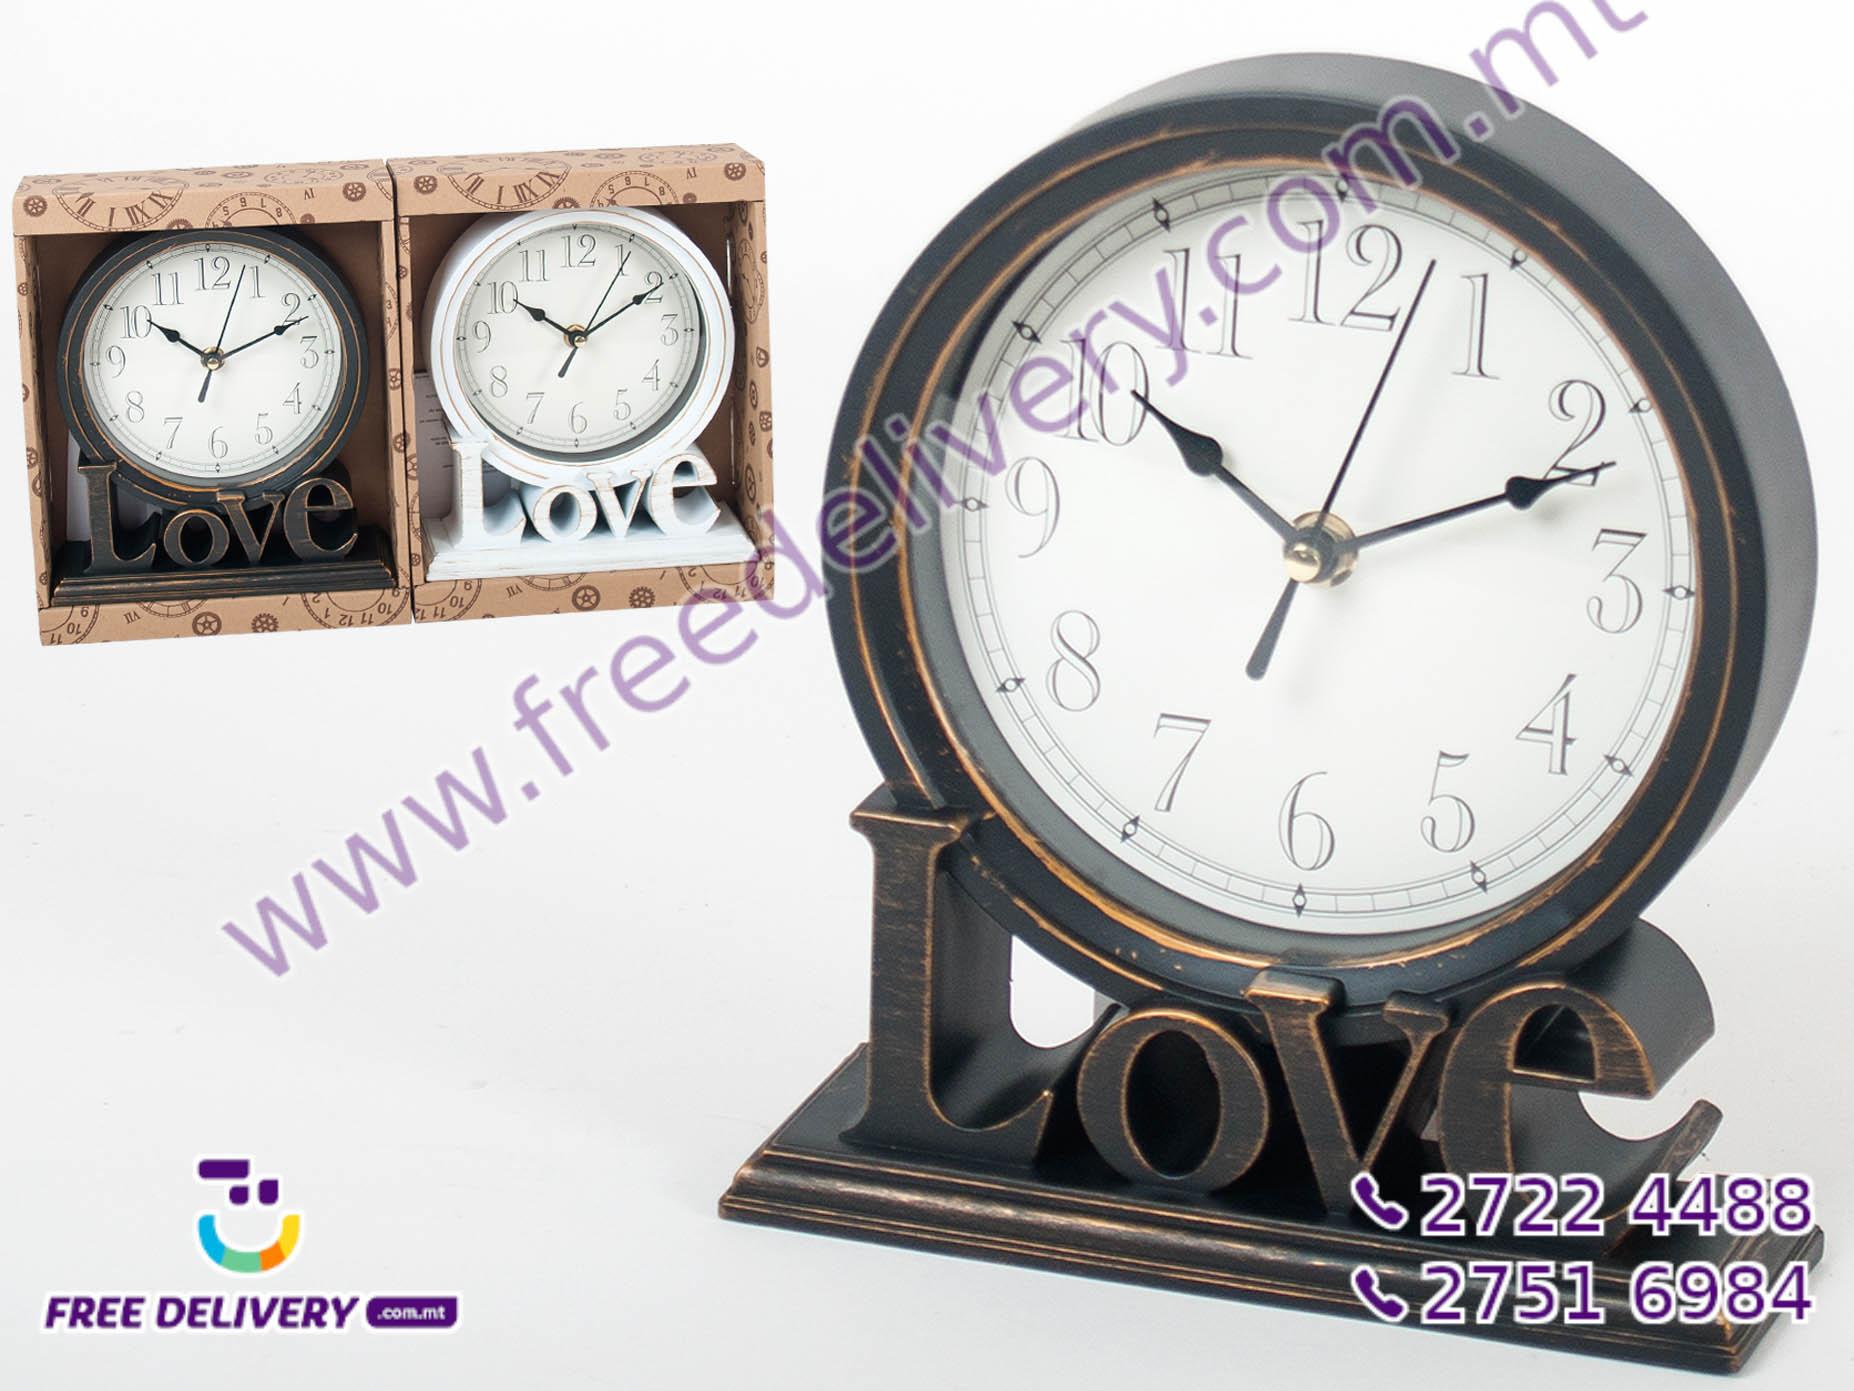 LOVE MANTLE CLOCK 20.6CMx18.6CM GE868471